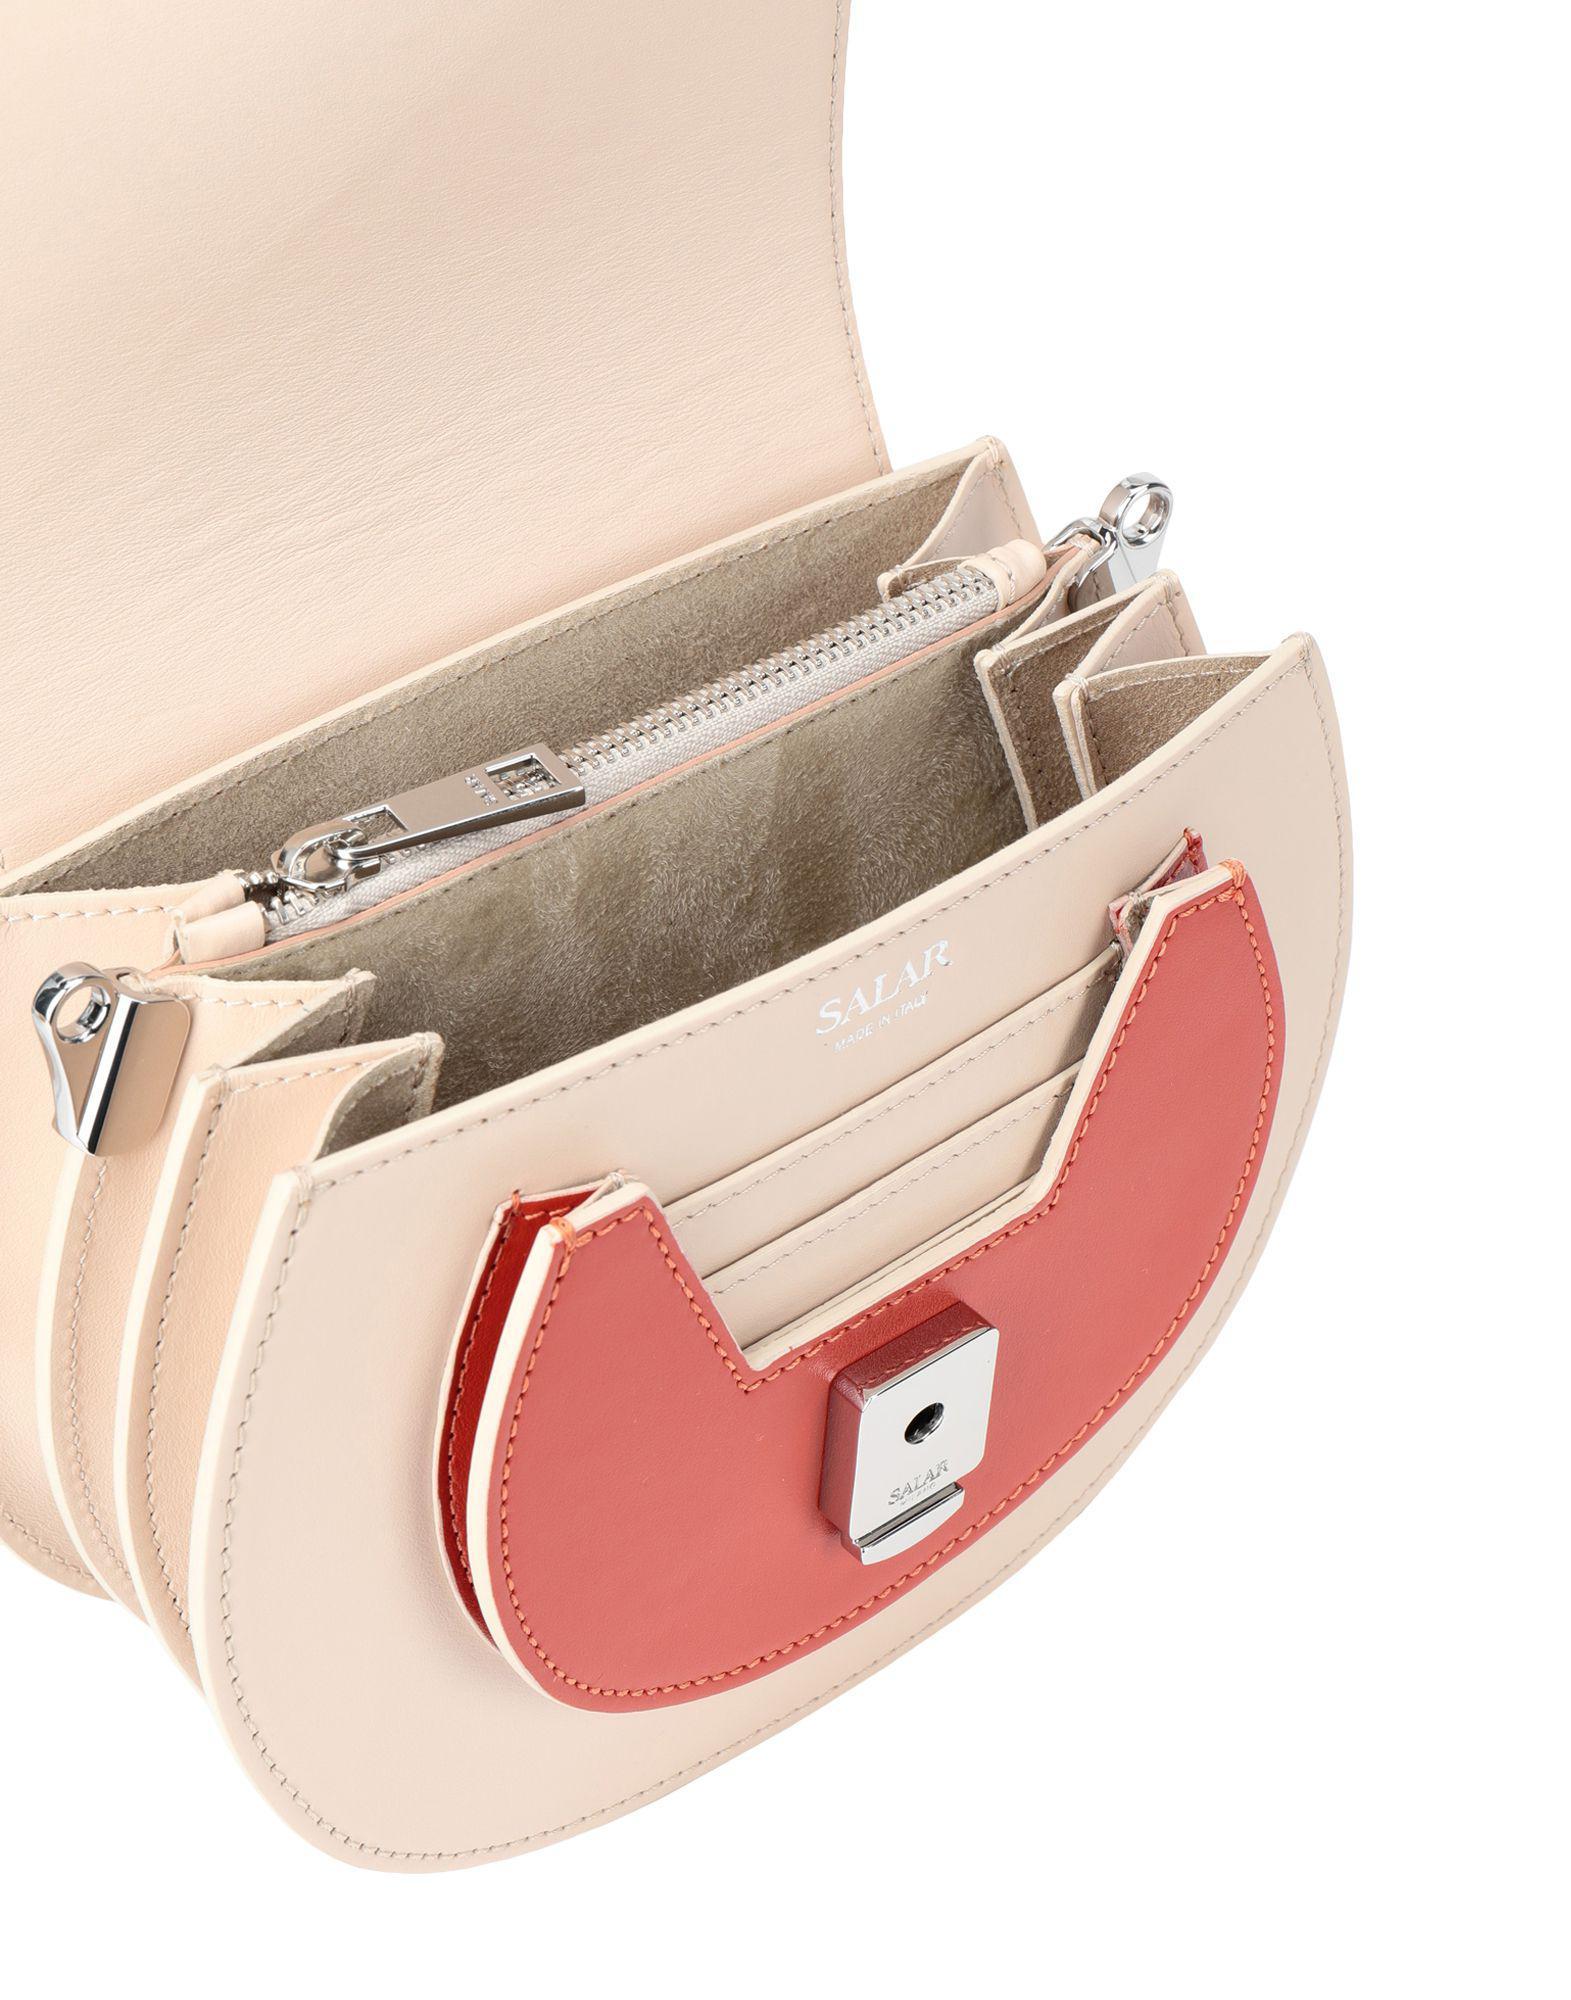 Salar Leather Cross-body Bag in Ivory (White)